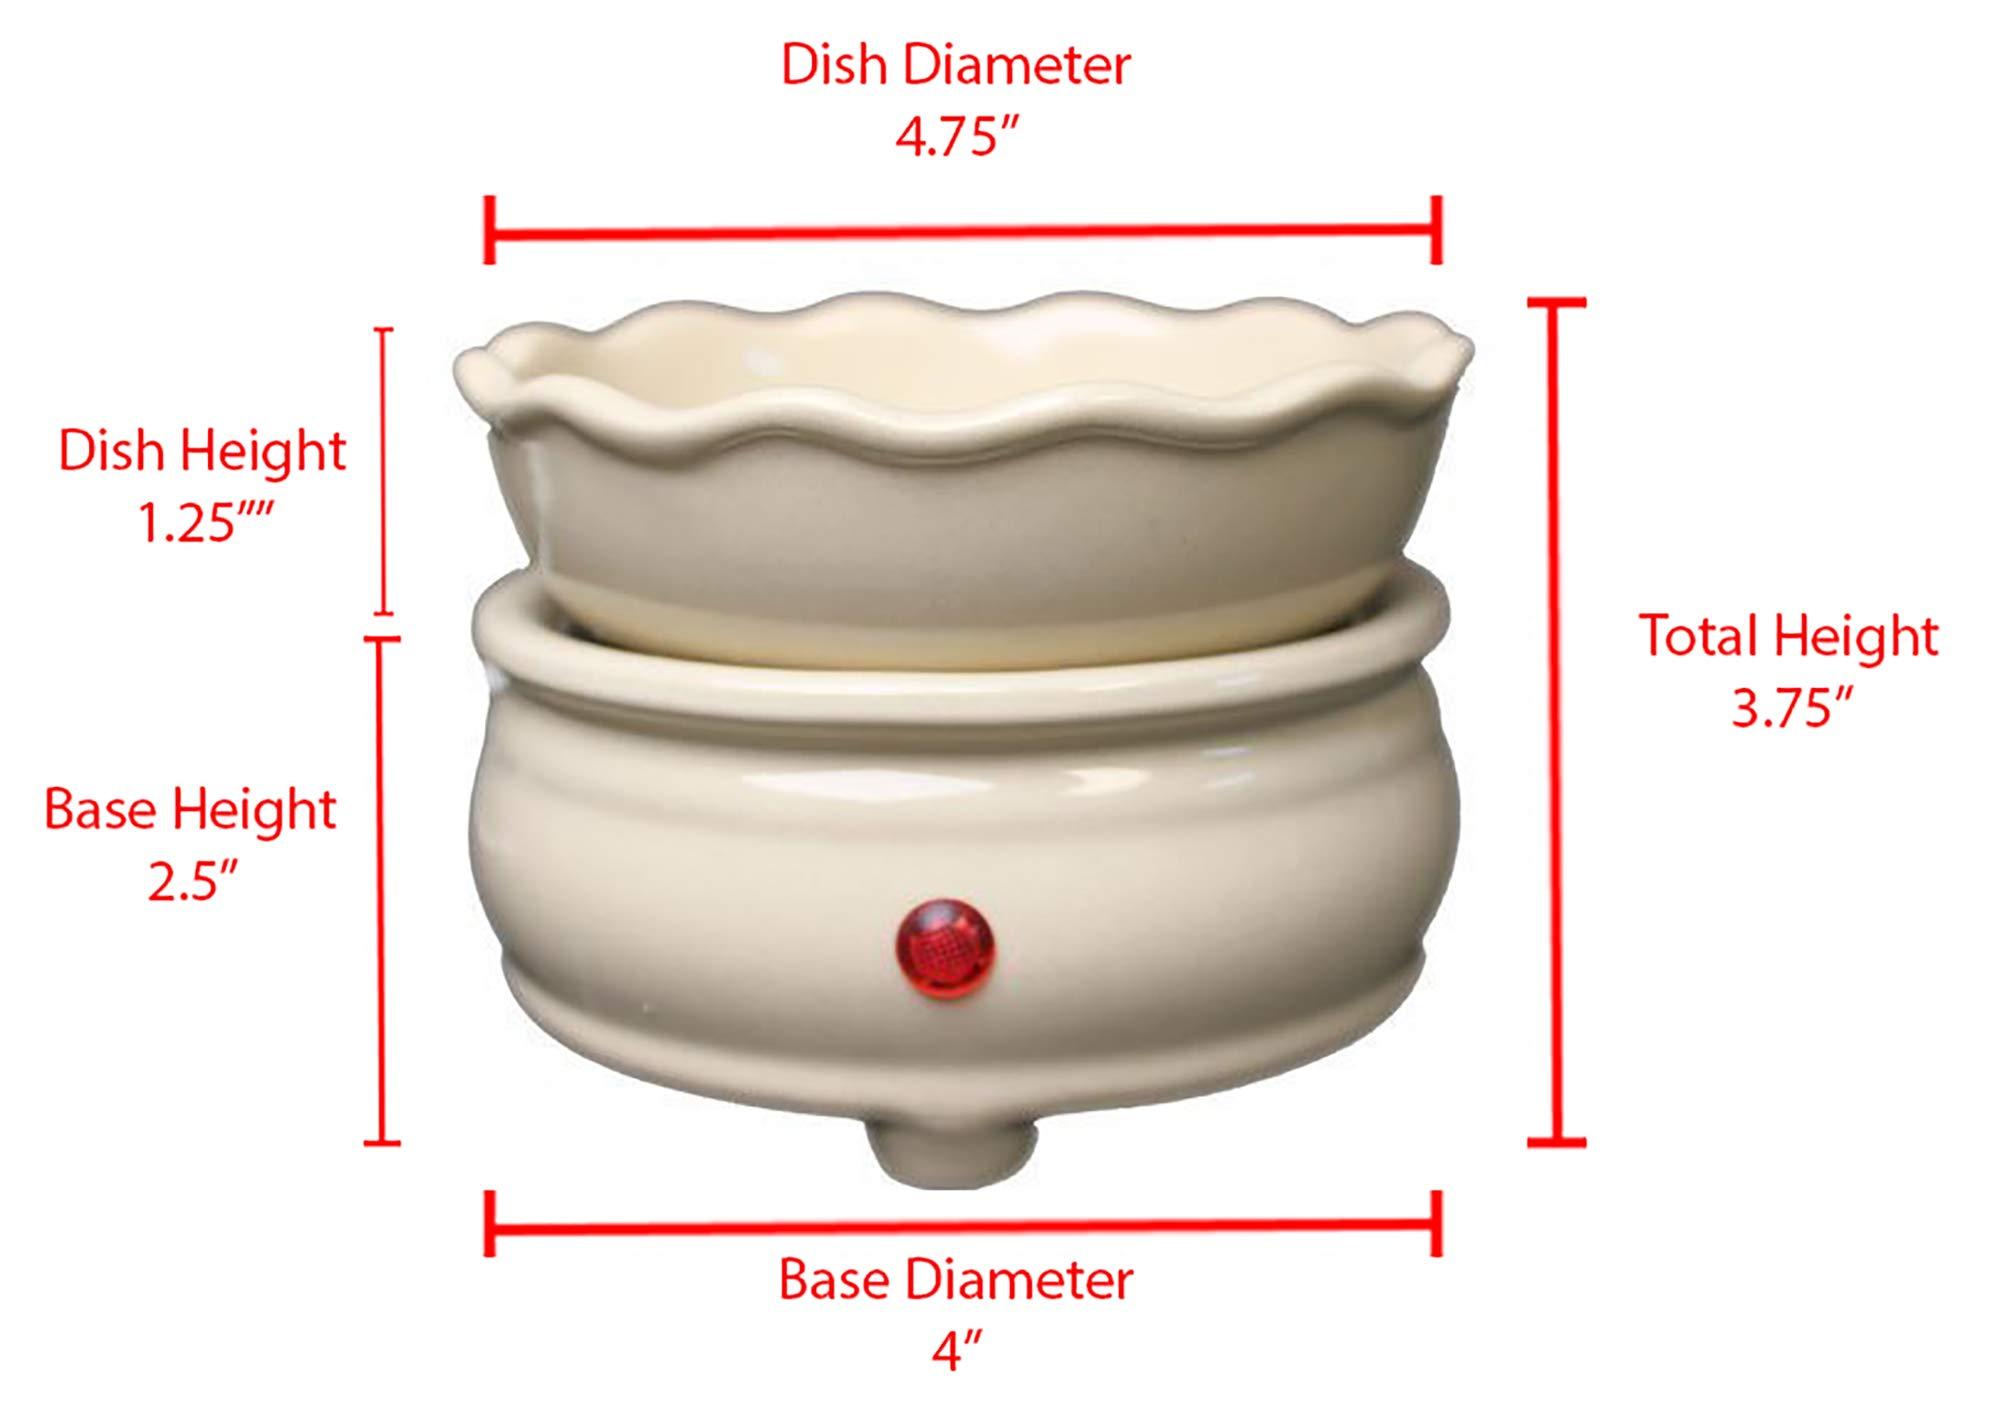 Original Candle Warmer - Electric 2-in-1 Fragrance Air Freshener - 2 Piece Ceramic Melt Tart Wax Cube Melter - Eliminate Odors - Beige by OBI